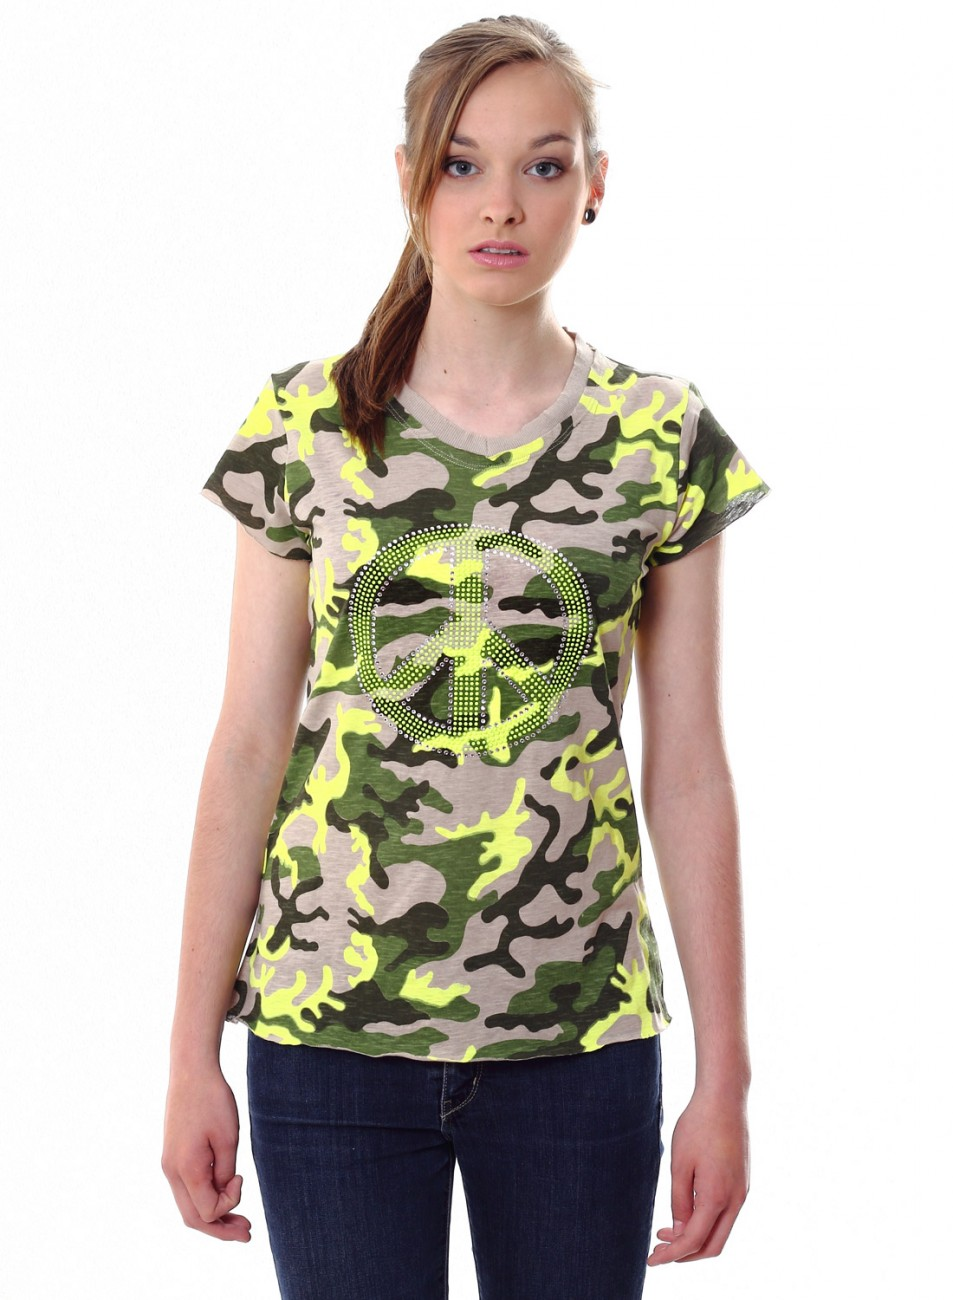 caspar damen shirt camouflage peace neon strass neon gelb bekleidung shirts tops. Black Bedroom Furniture Sets. Home Design Ideas